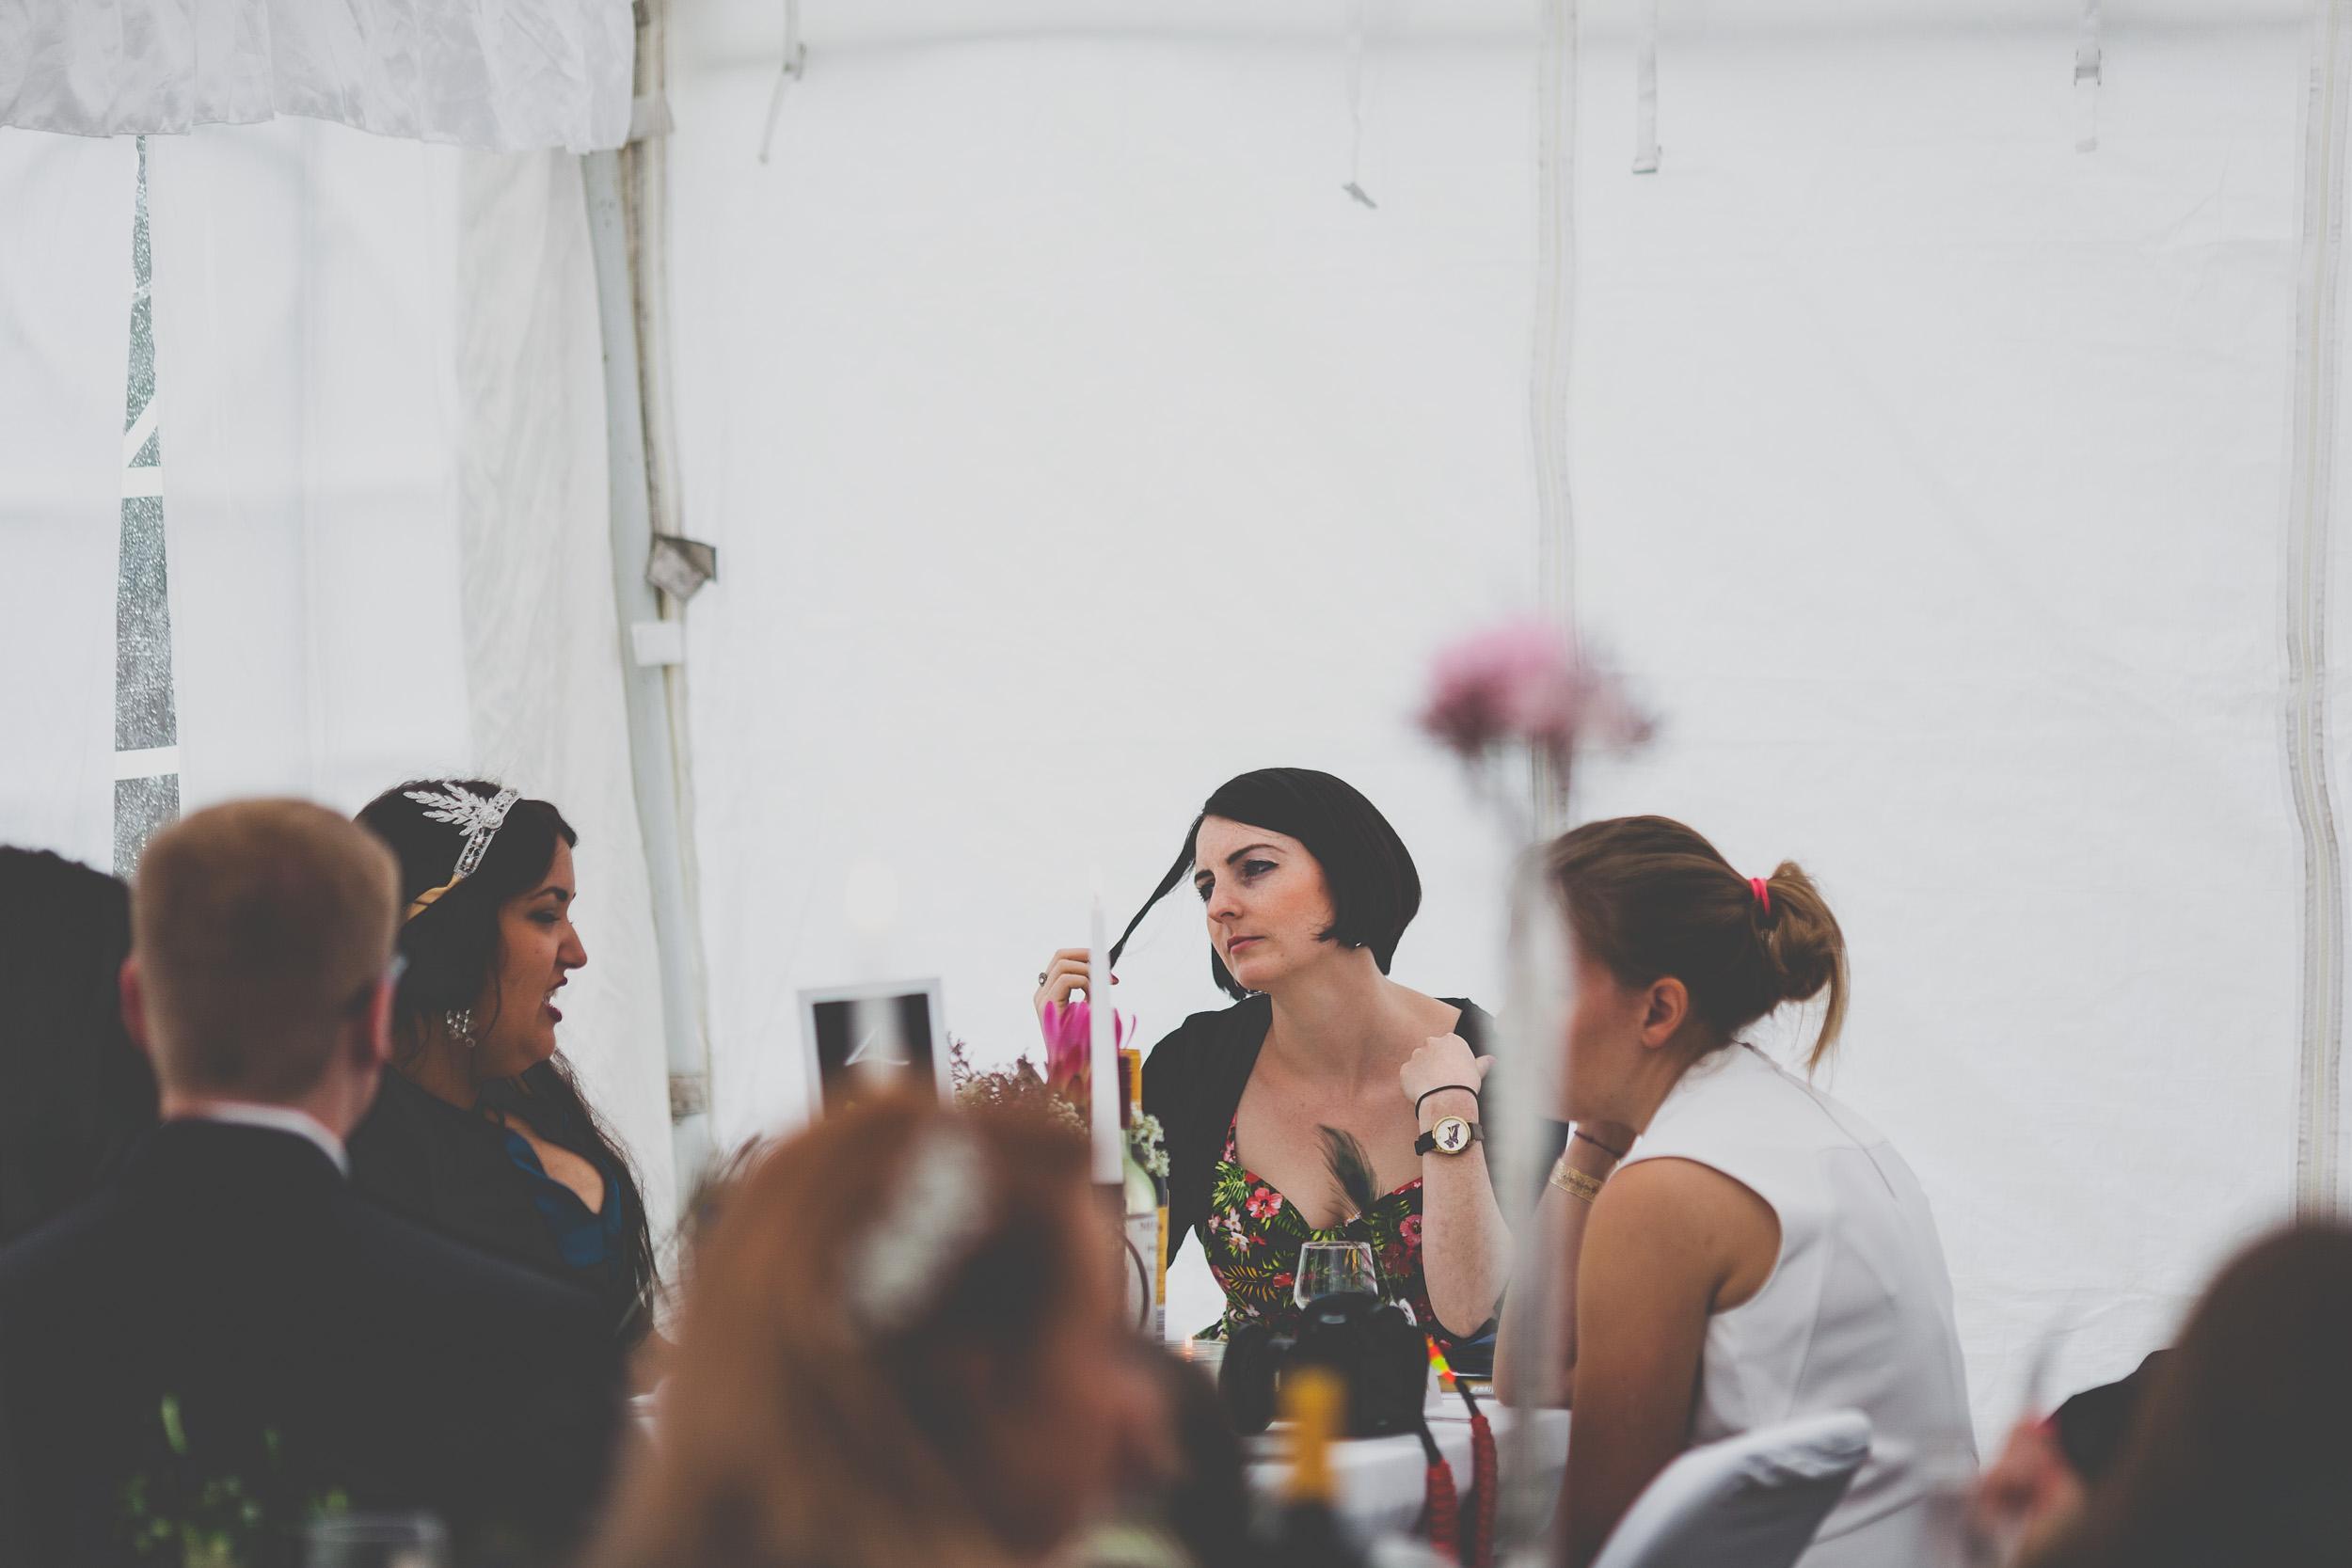 queen-elizabeths-hunting-lodge-epping-forest-wedding302.jpg